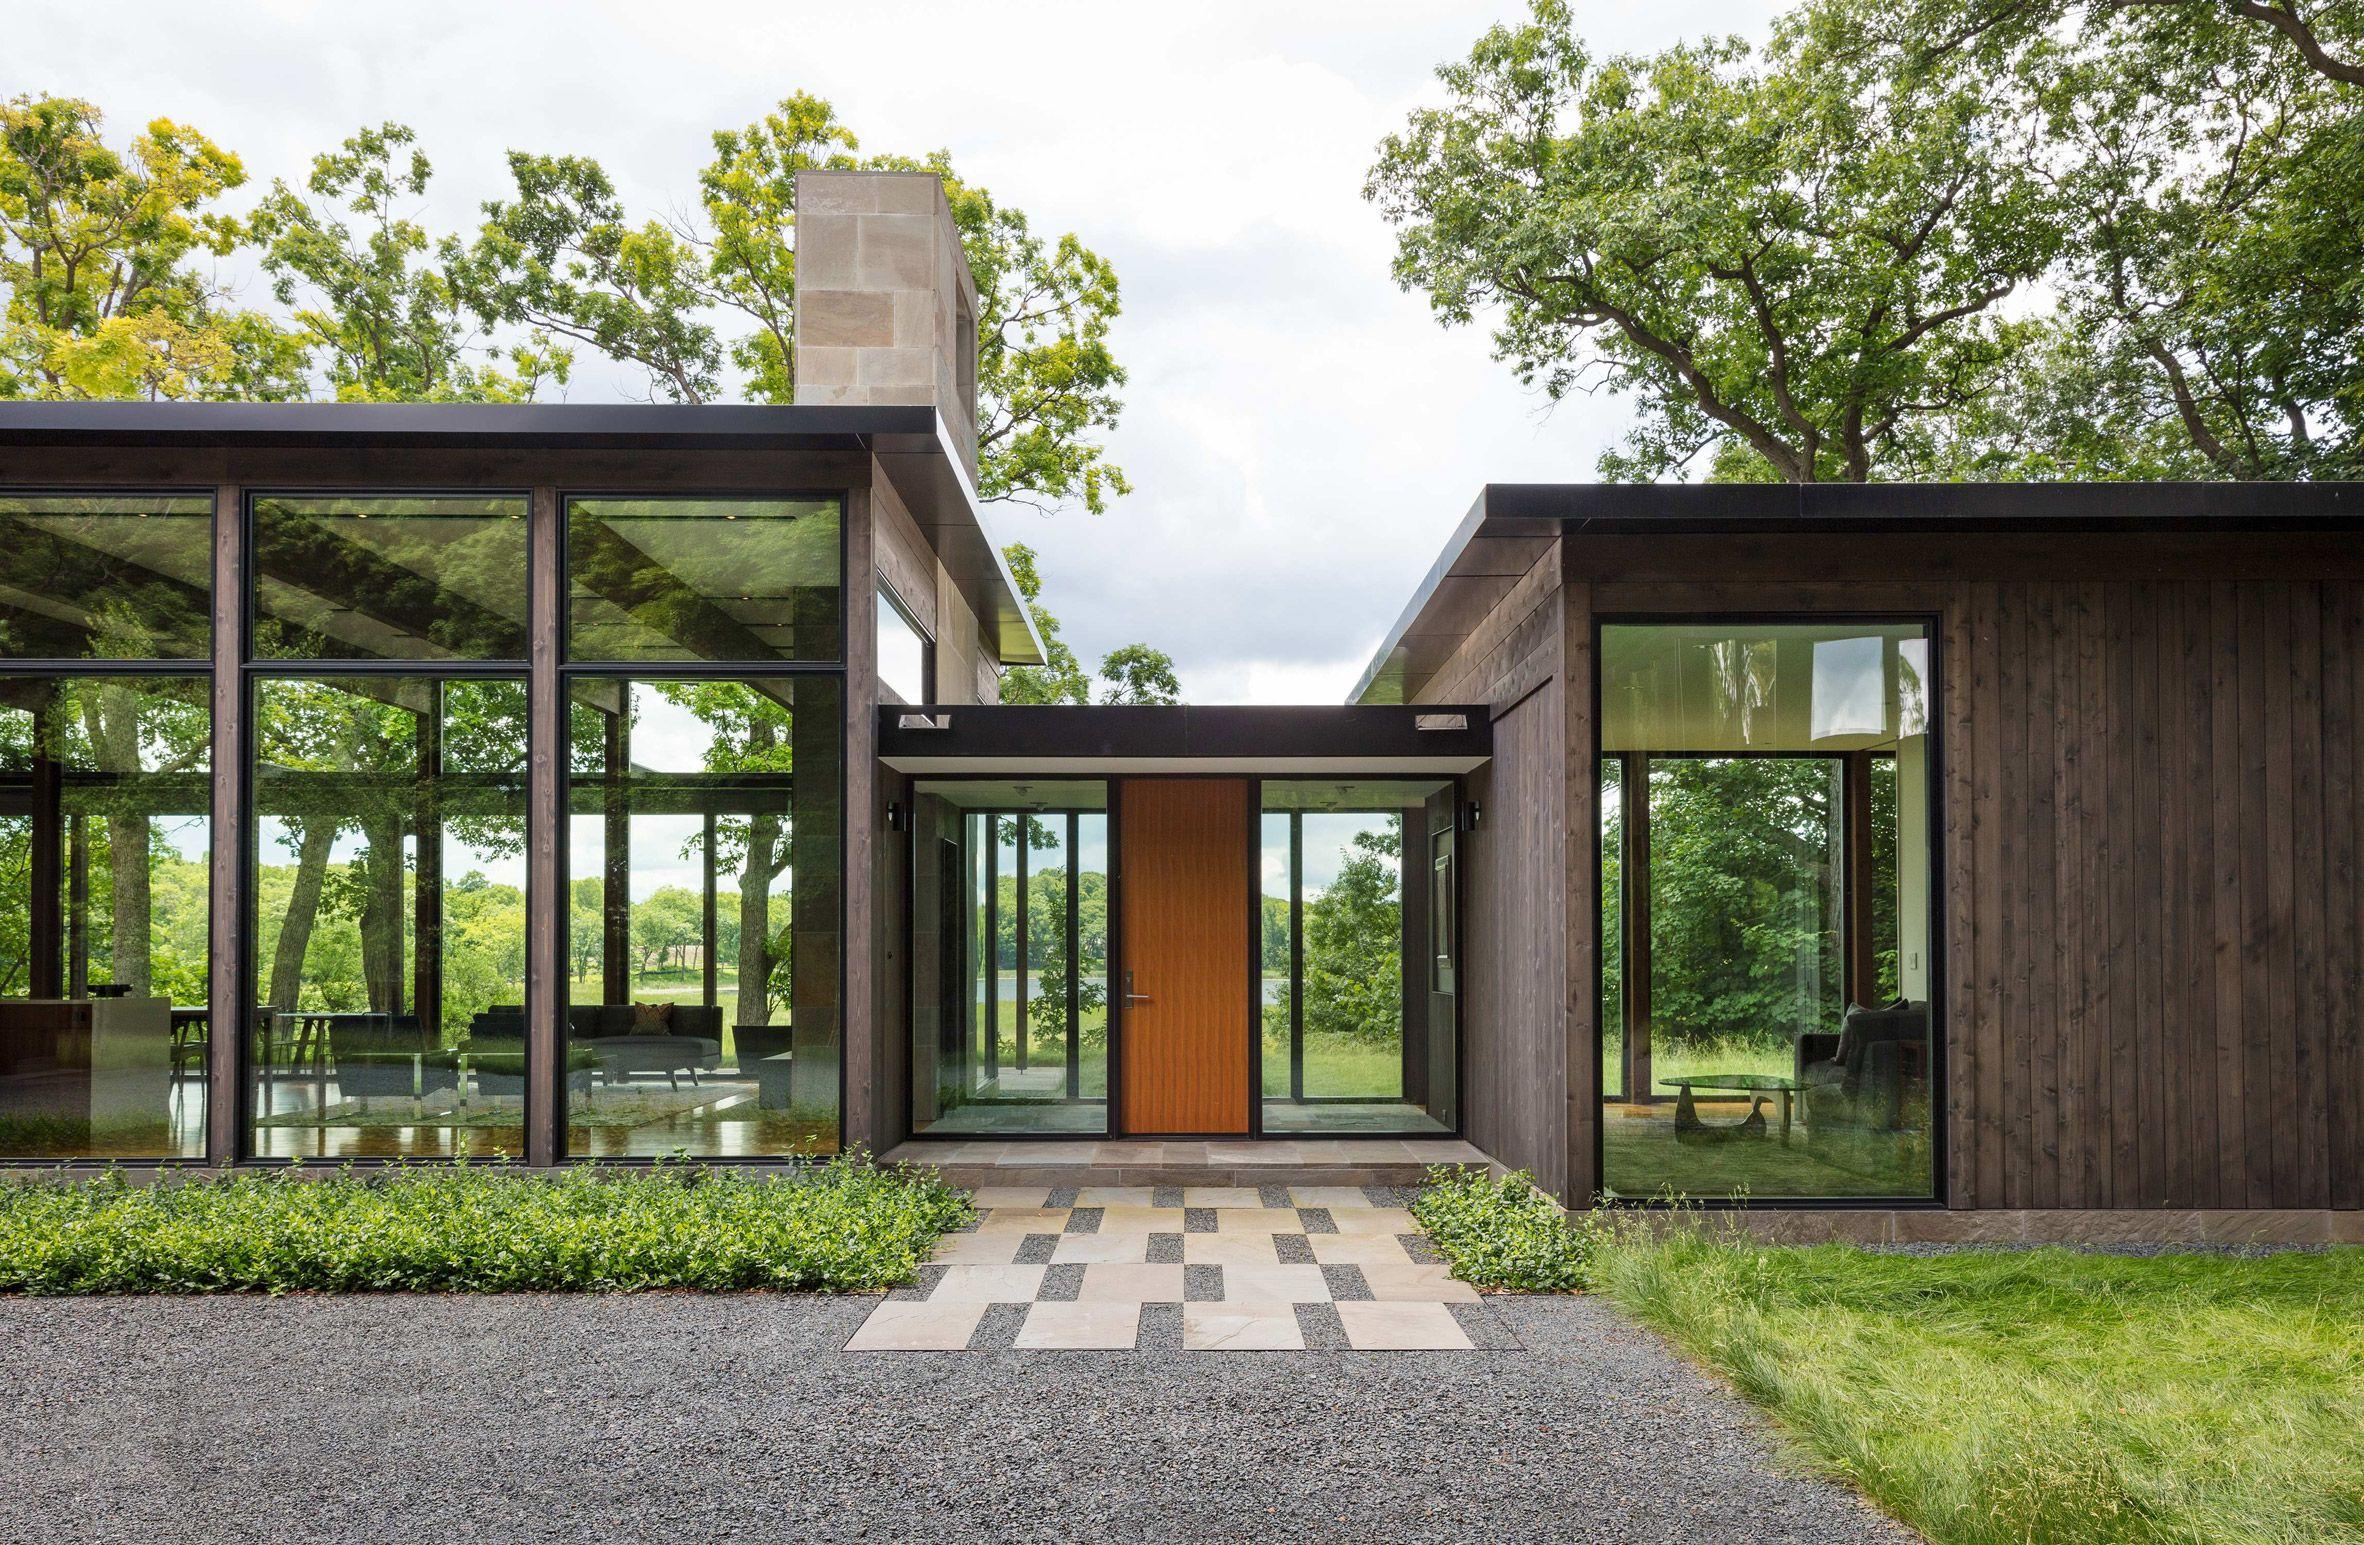 The woodland house minnesota altus architecture design also rh pinterest